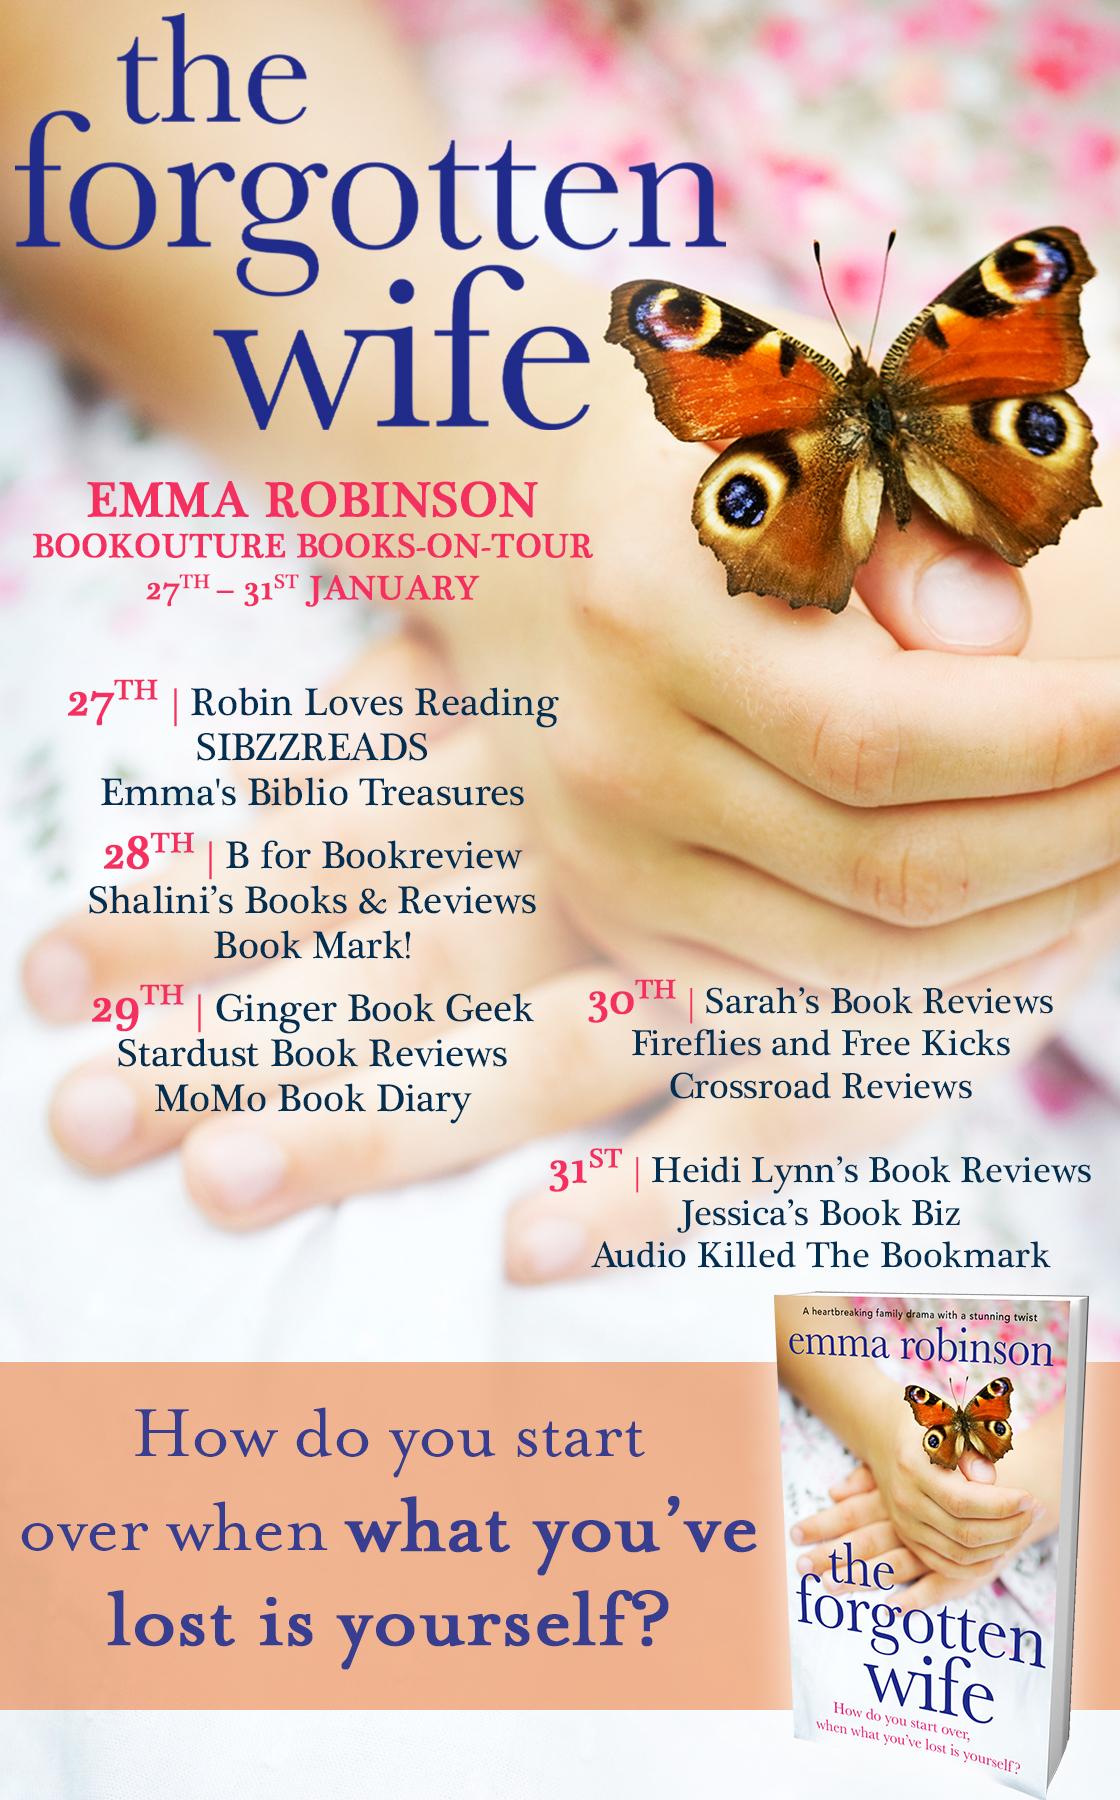 The Forgotten Wife - Blog Tour